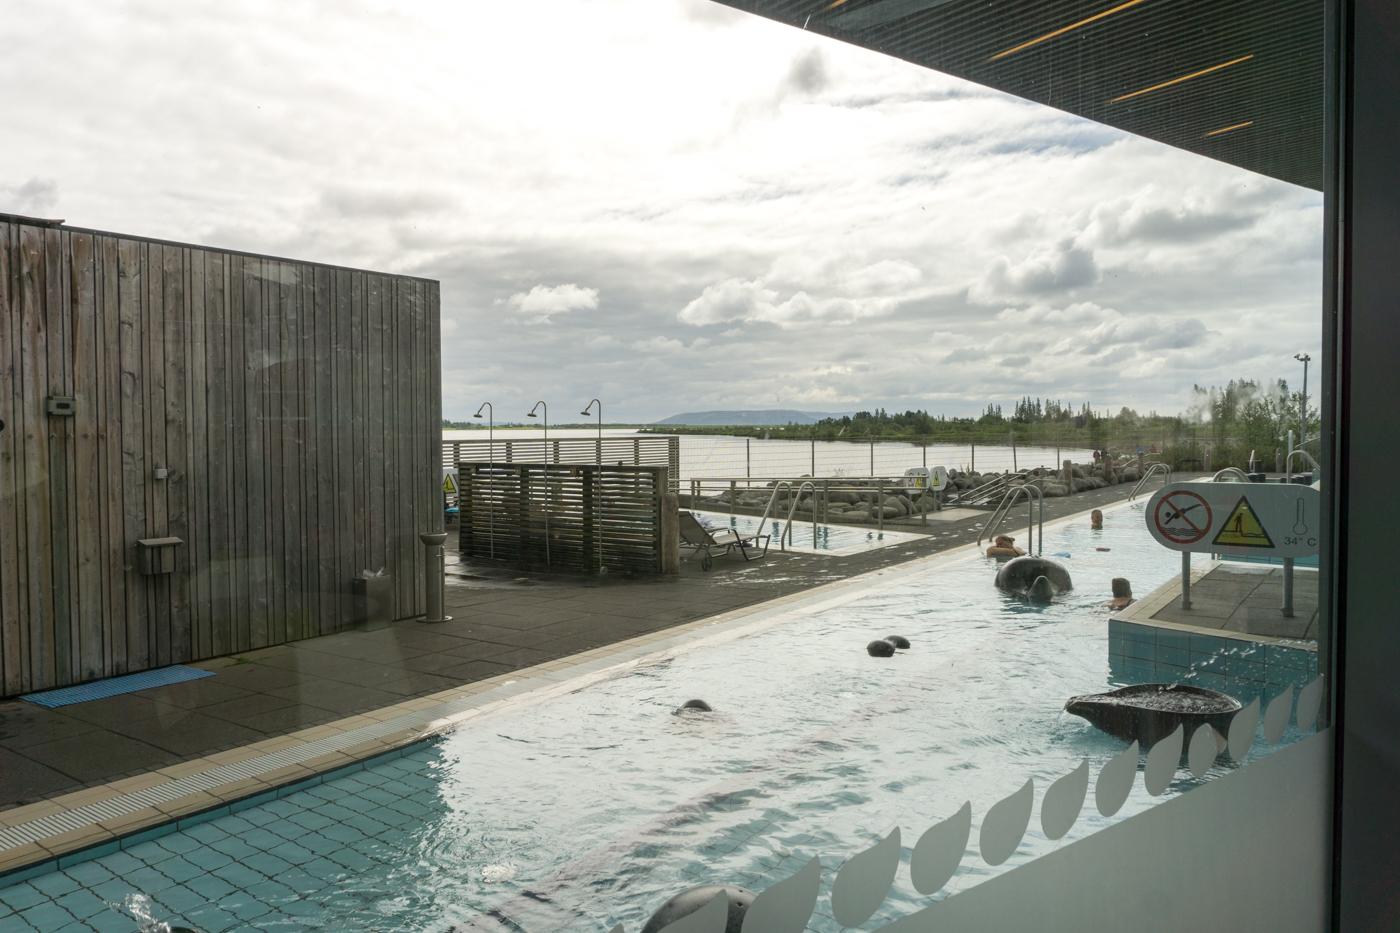 Sources chaudes - Laugarvatn Fontana, Islande